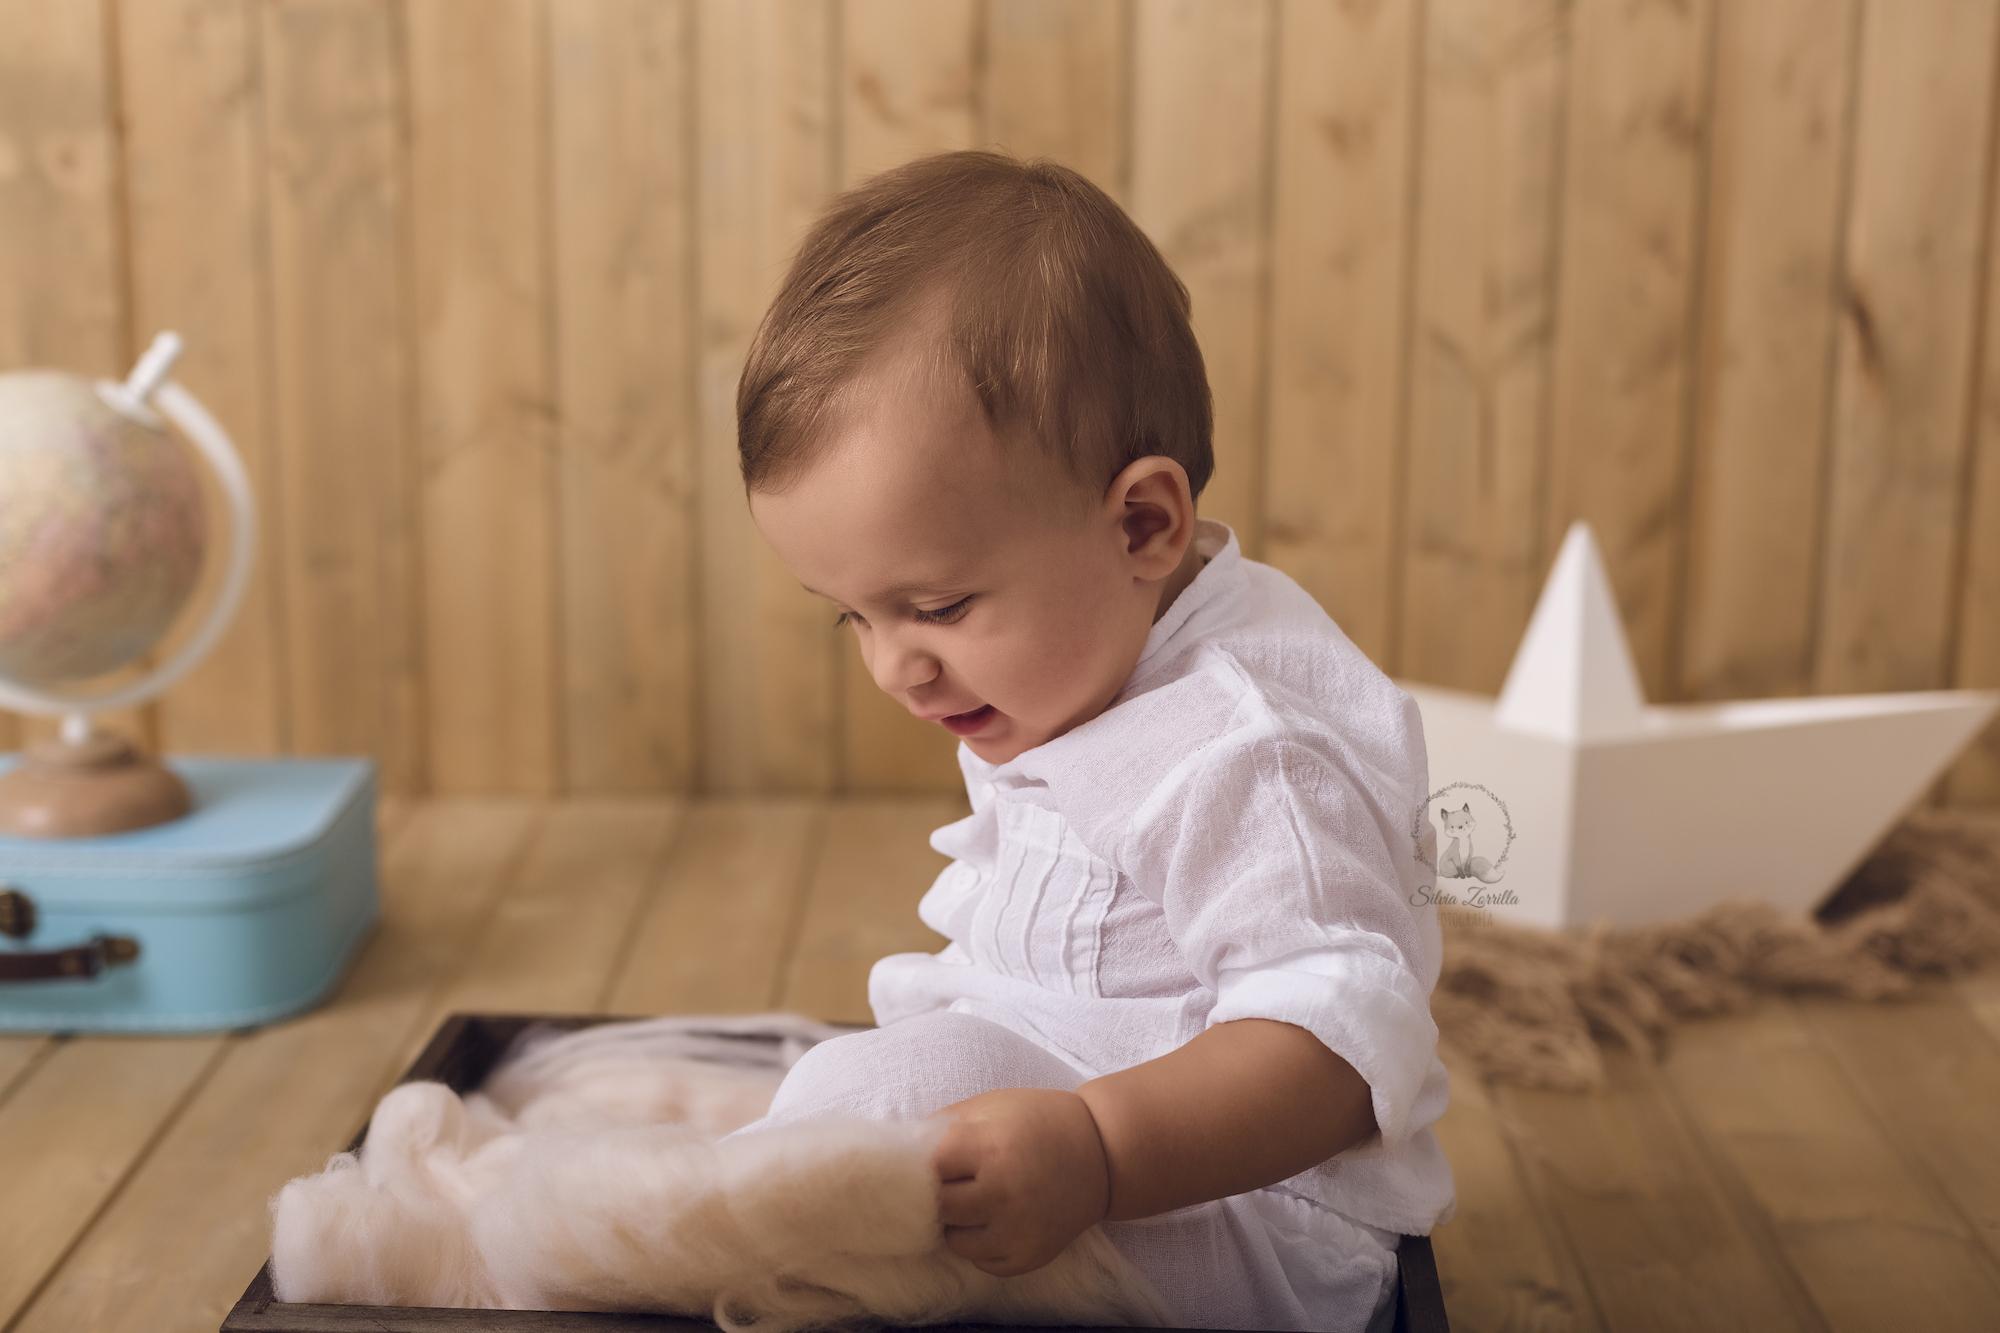 Fotografía infantil en ibiza fotografo infantil ibiza fotógrafo de recién nacido en ibiza eivissa newborn photography